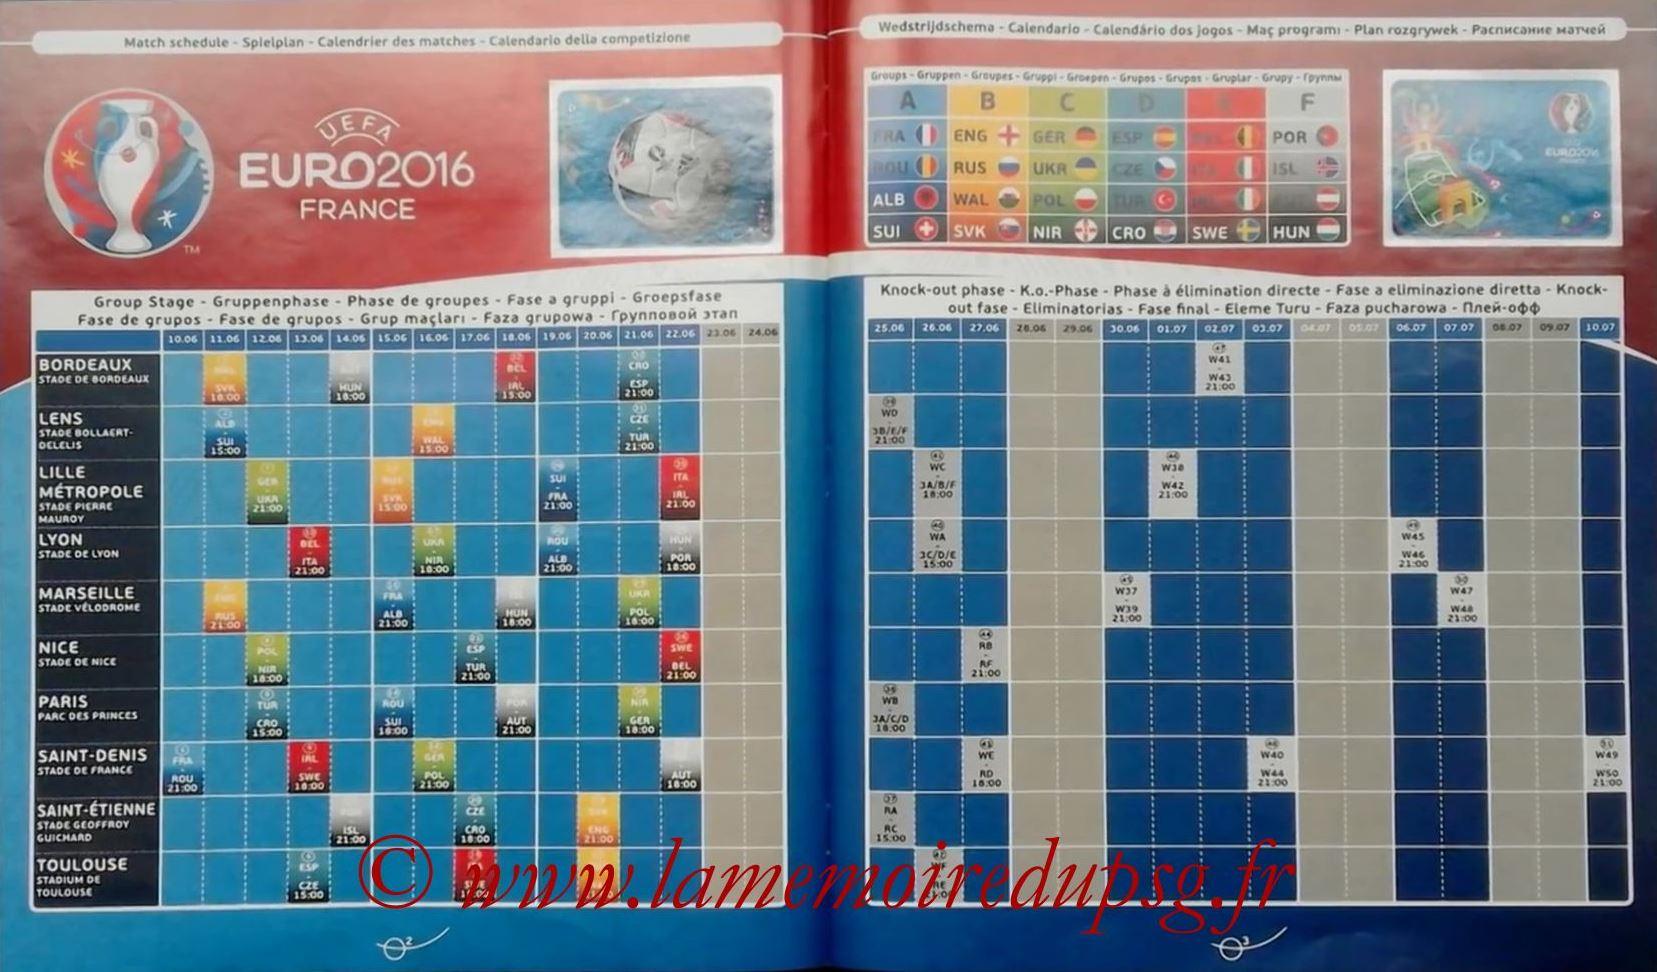 Panini Euro 2016 Stickers - Pages 02 et 03 - Calendrier des matchs